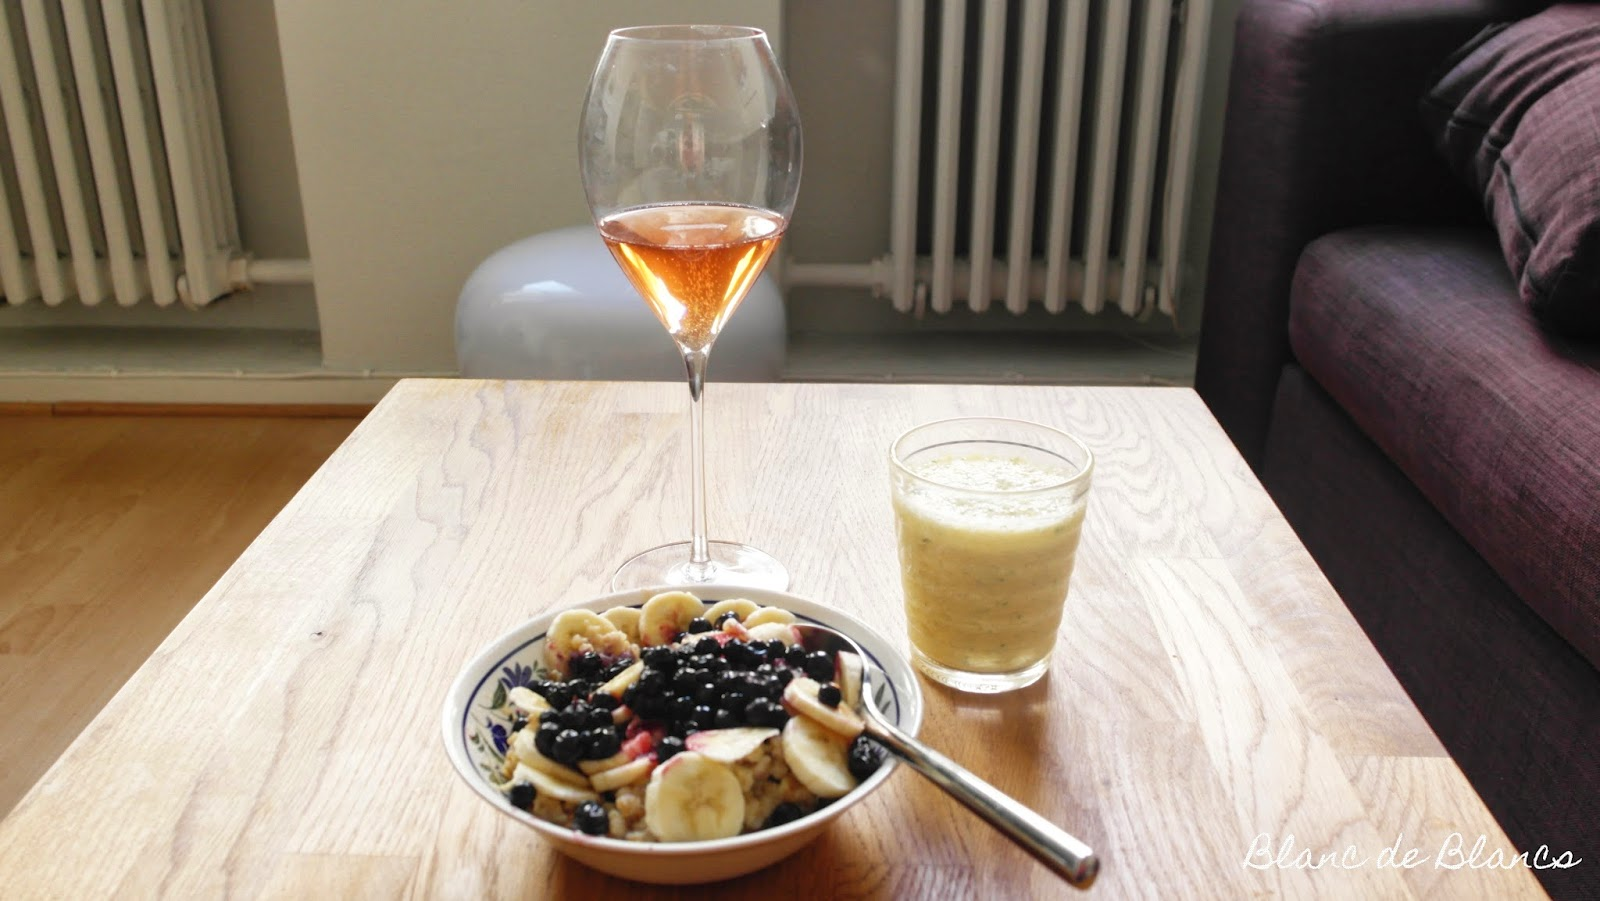 Samppanja-aamiainen puurolla - www.blancdeblancs.fi